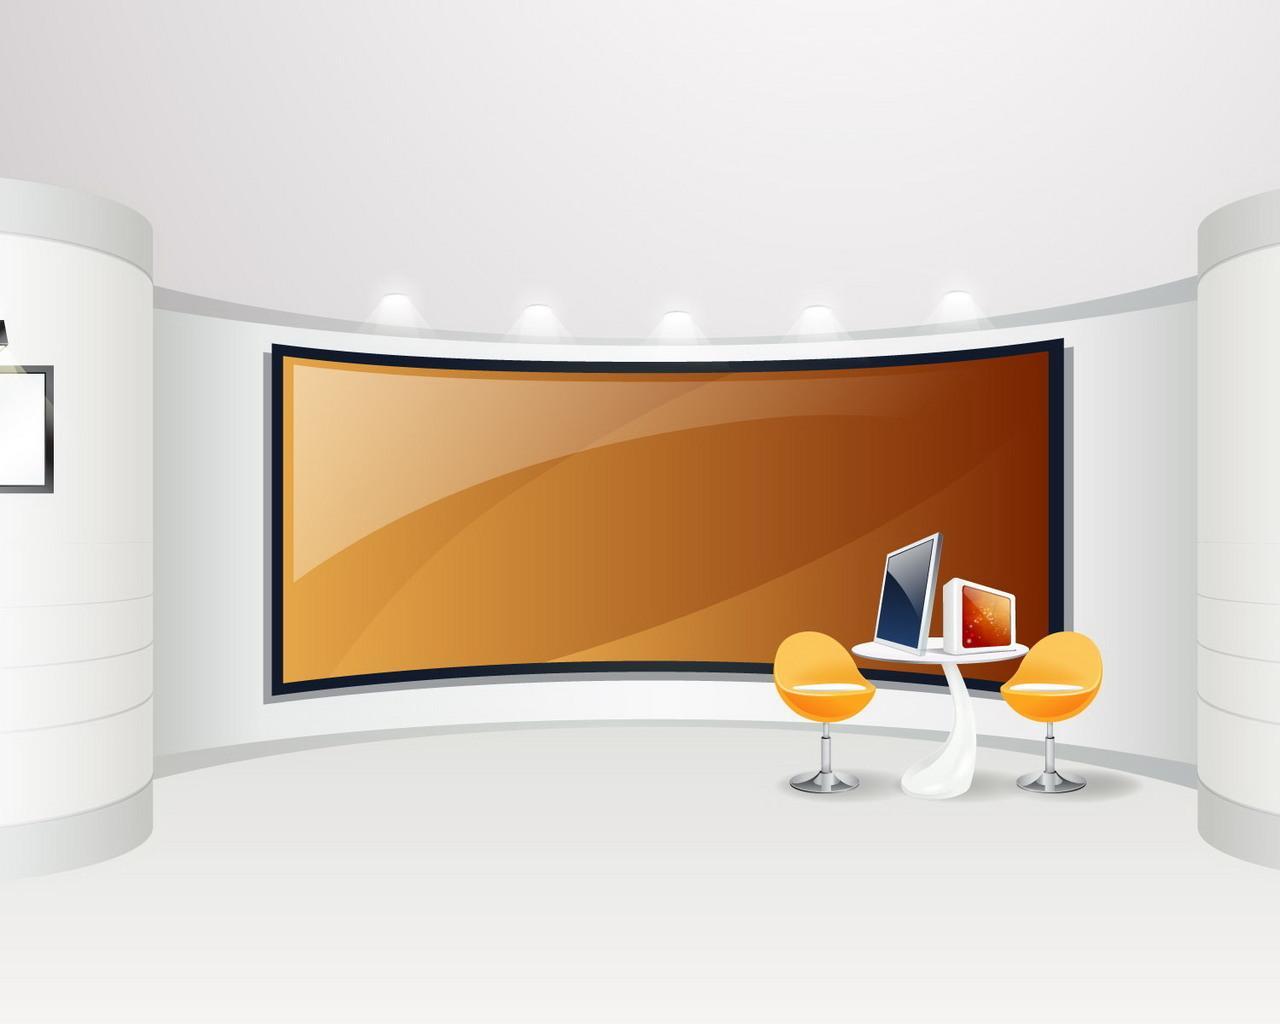 Sensational Empty Office Desktop Wallpaper Wallpapersafari Largest Home Design Picture Inspirations Pitcheantrous